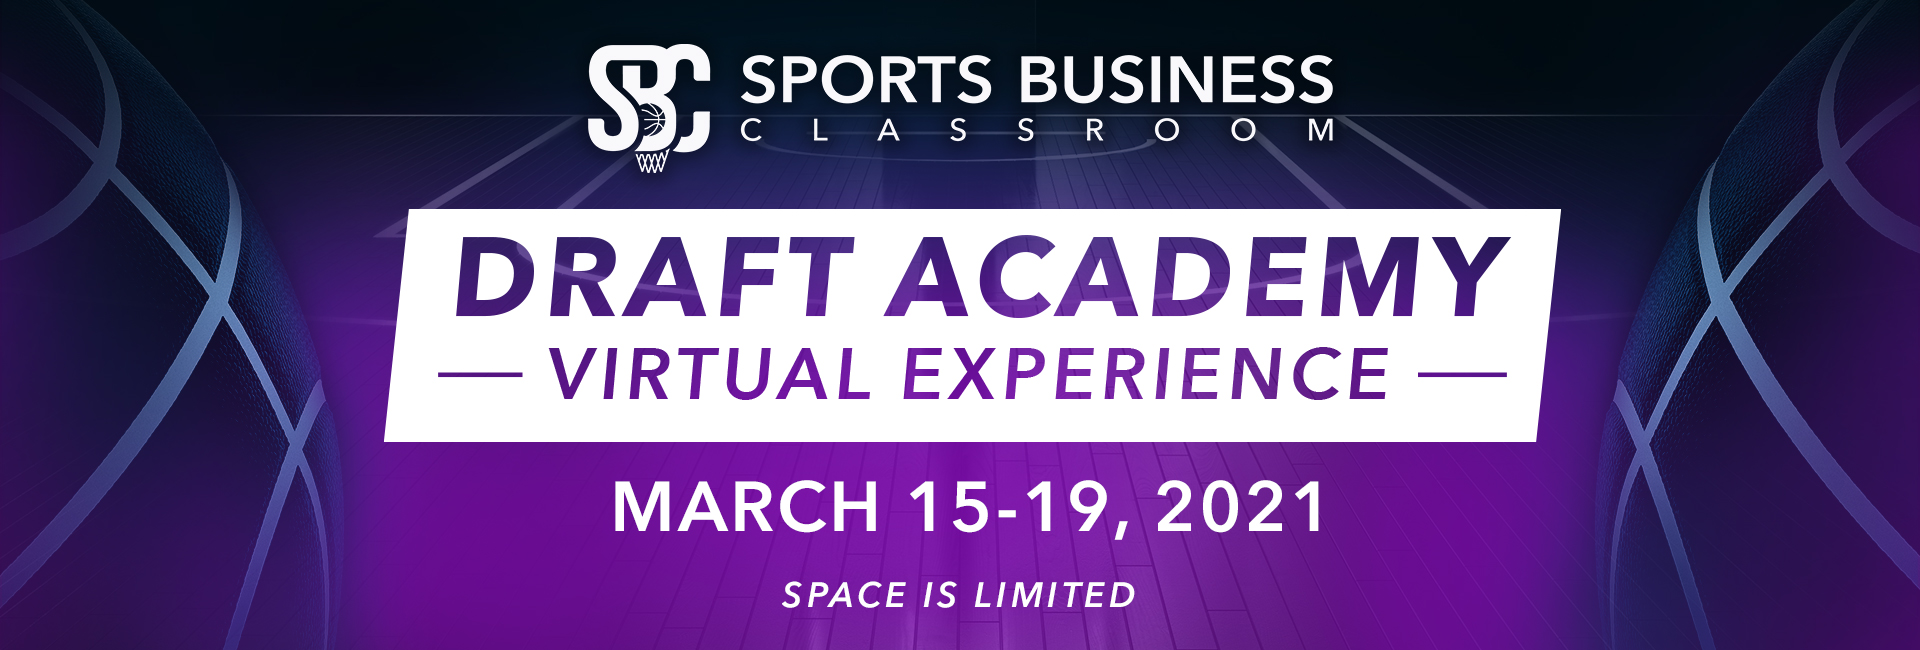 SBC Draft Academy Virtual Experience